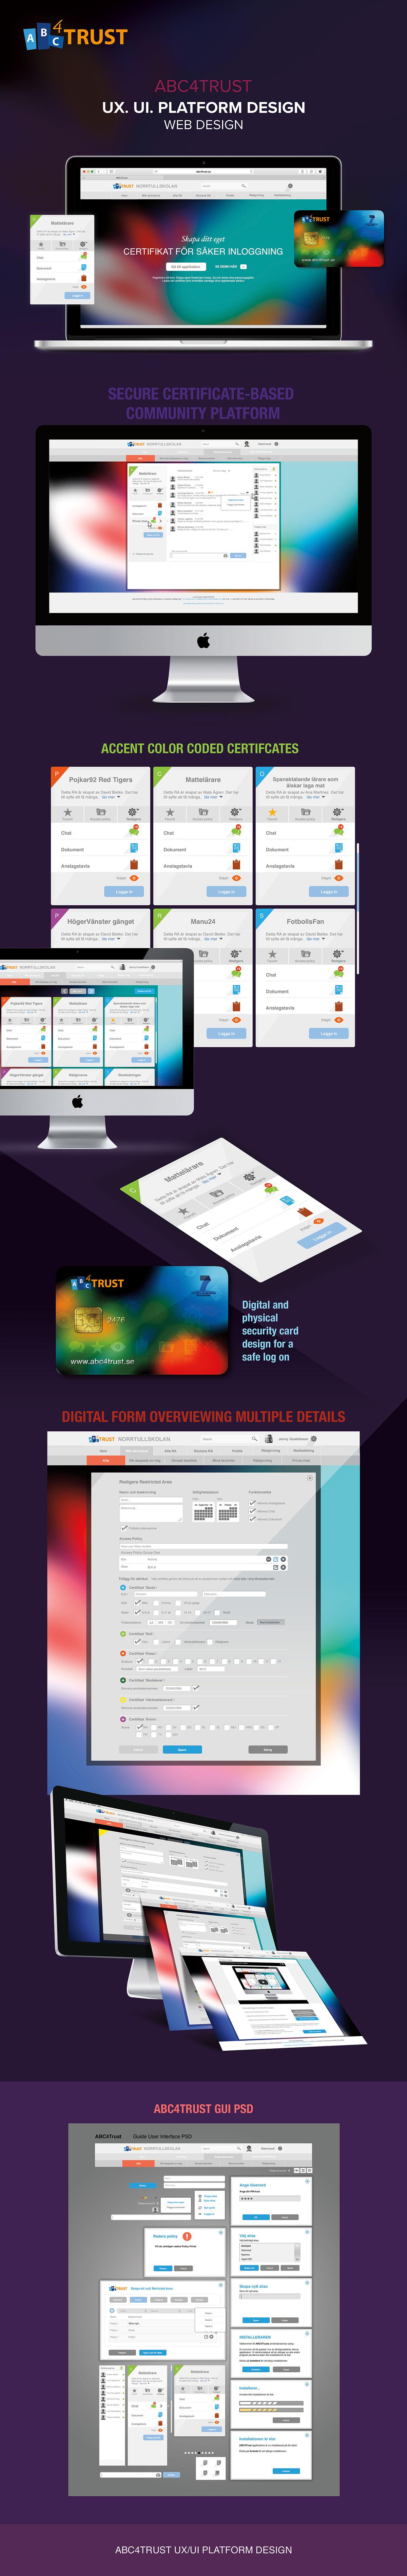 Adobe Portfolio Interface User Interaction Web design art iconography information ux UI